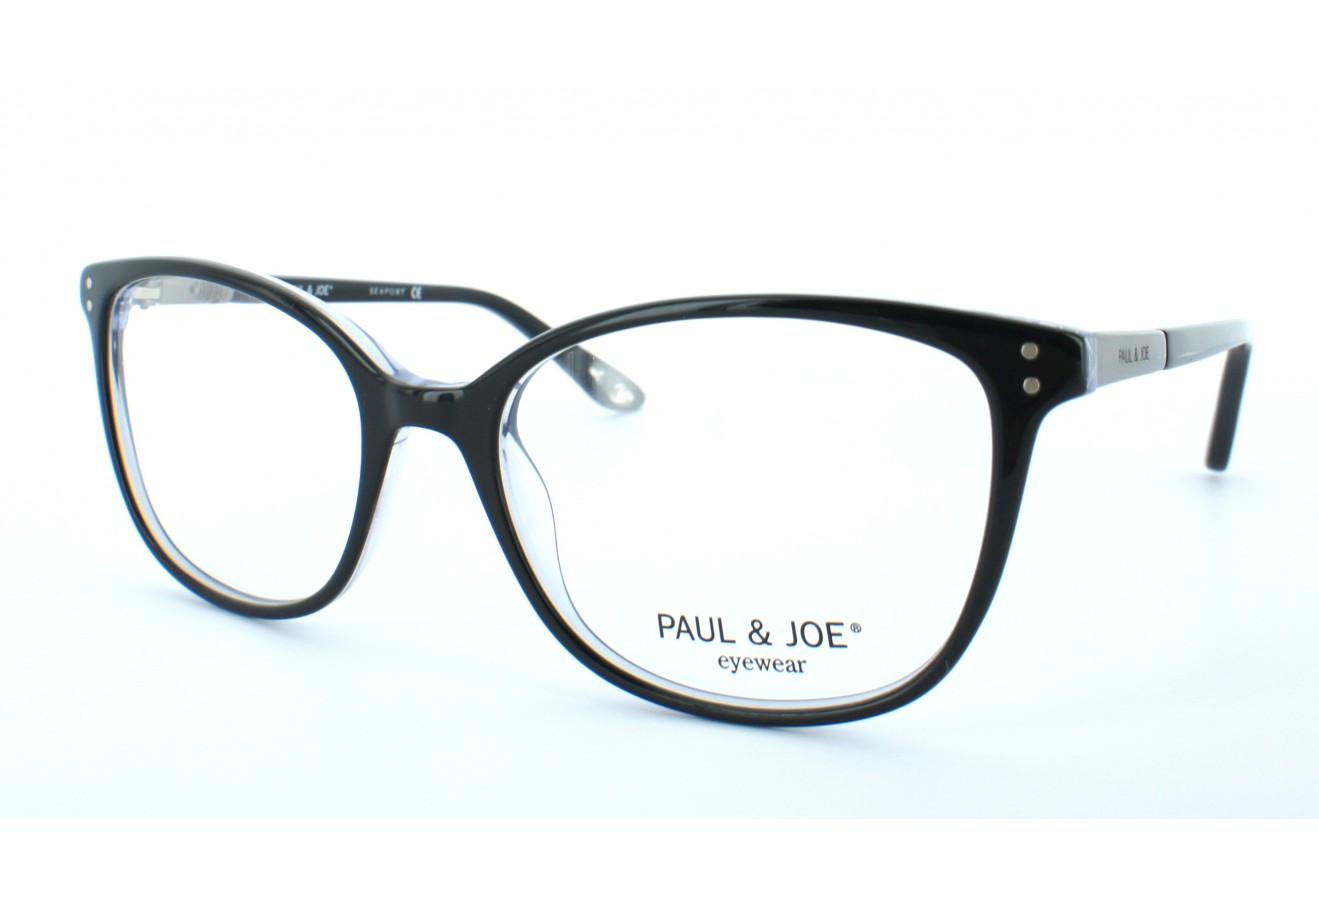 6962342cea8975 Lunettes Paul And Joe. paul joe glasses lunettes pinterest glasses ...